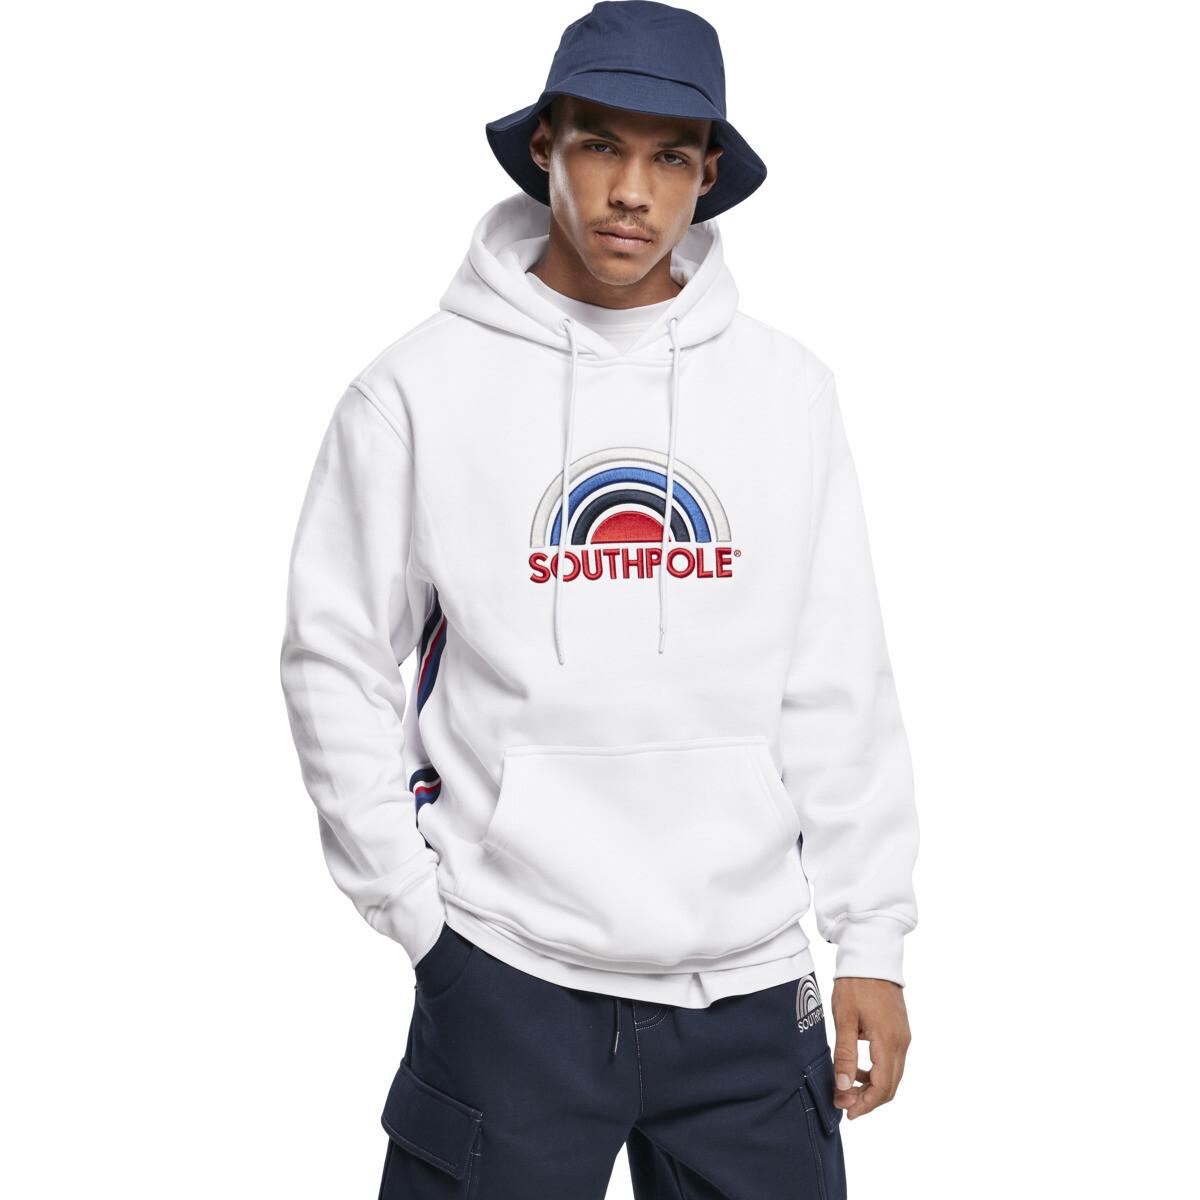 Southpole Multi Color Logo Hoody